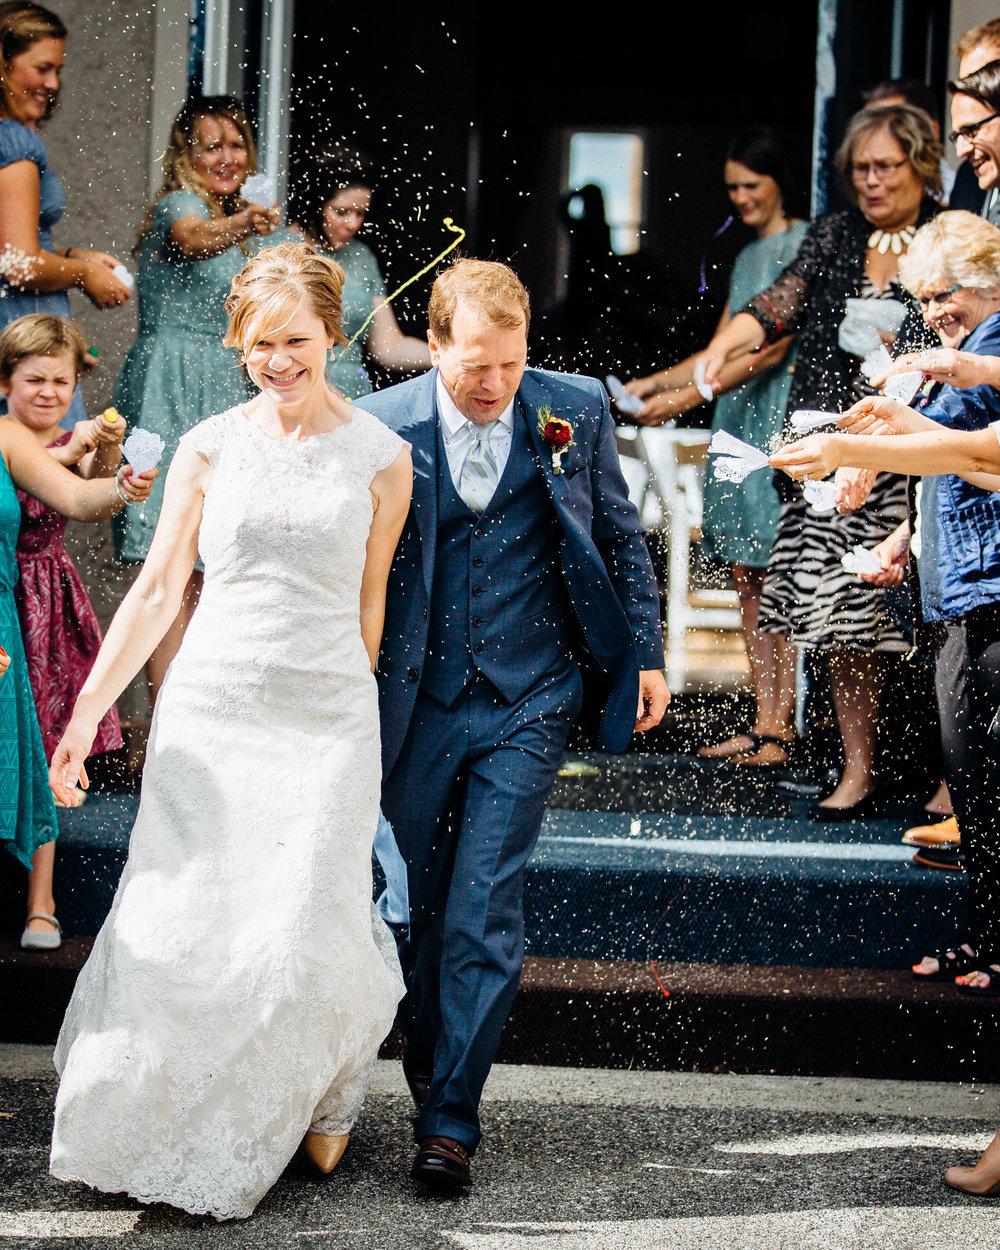 Bellingham Washington Wedding, departing from the Majestic Ballroom